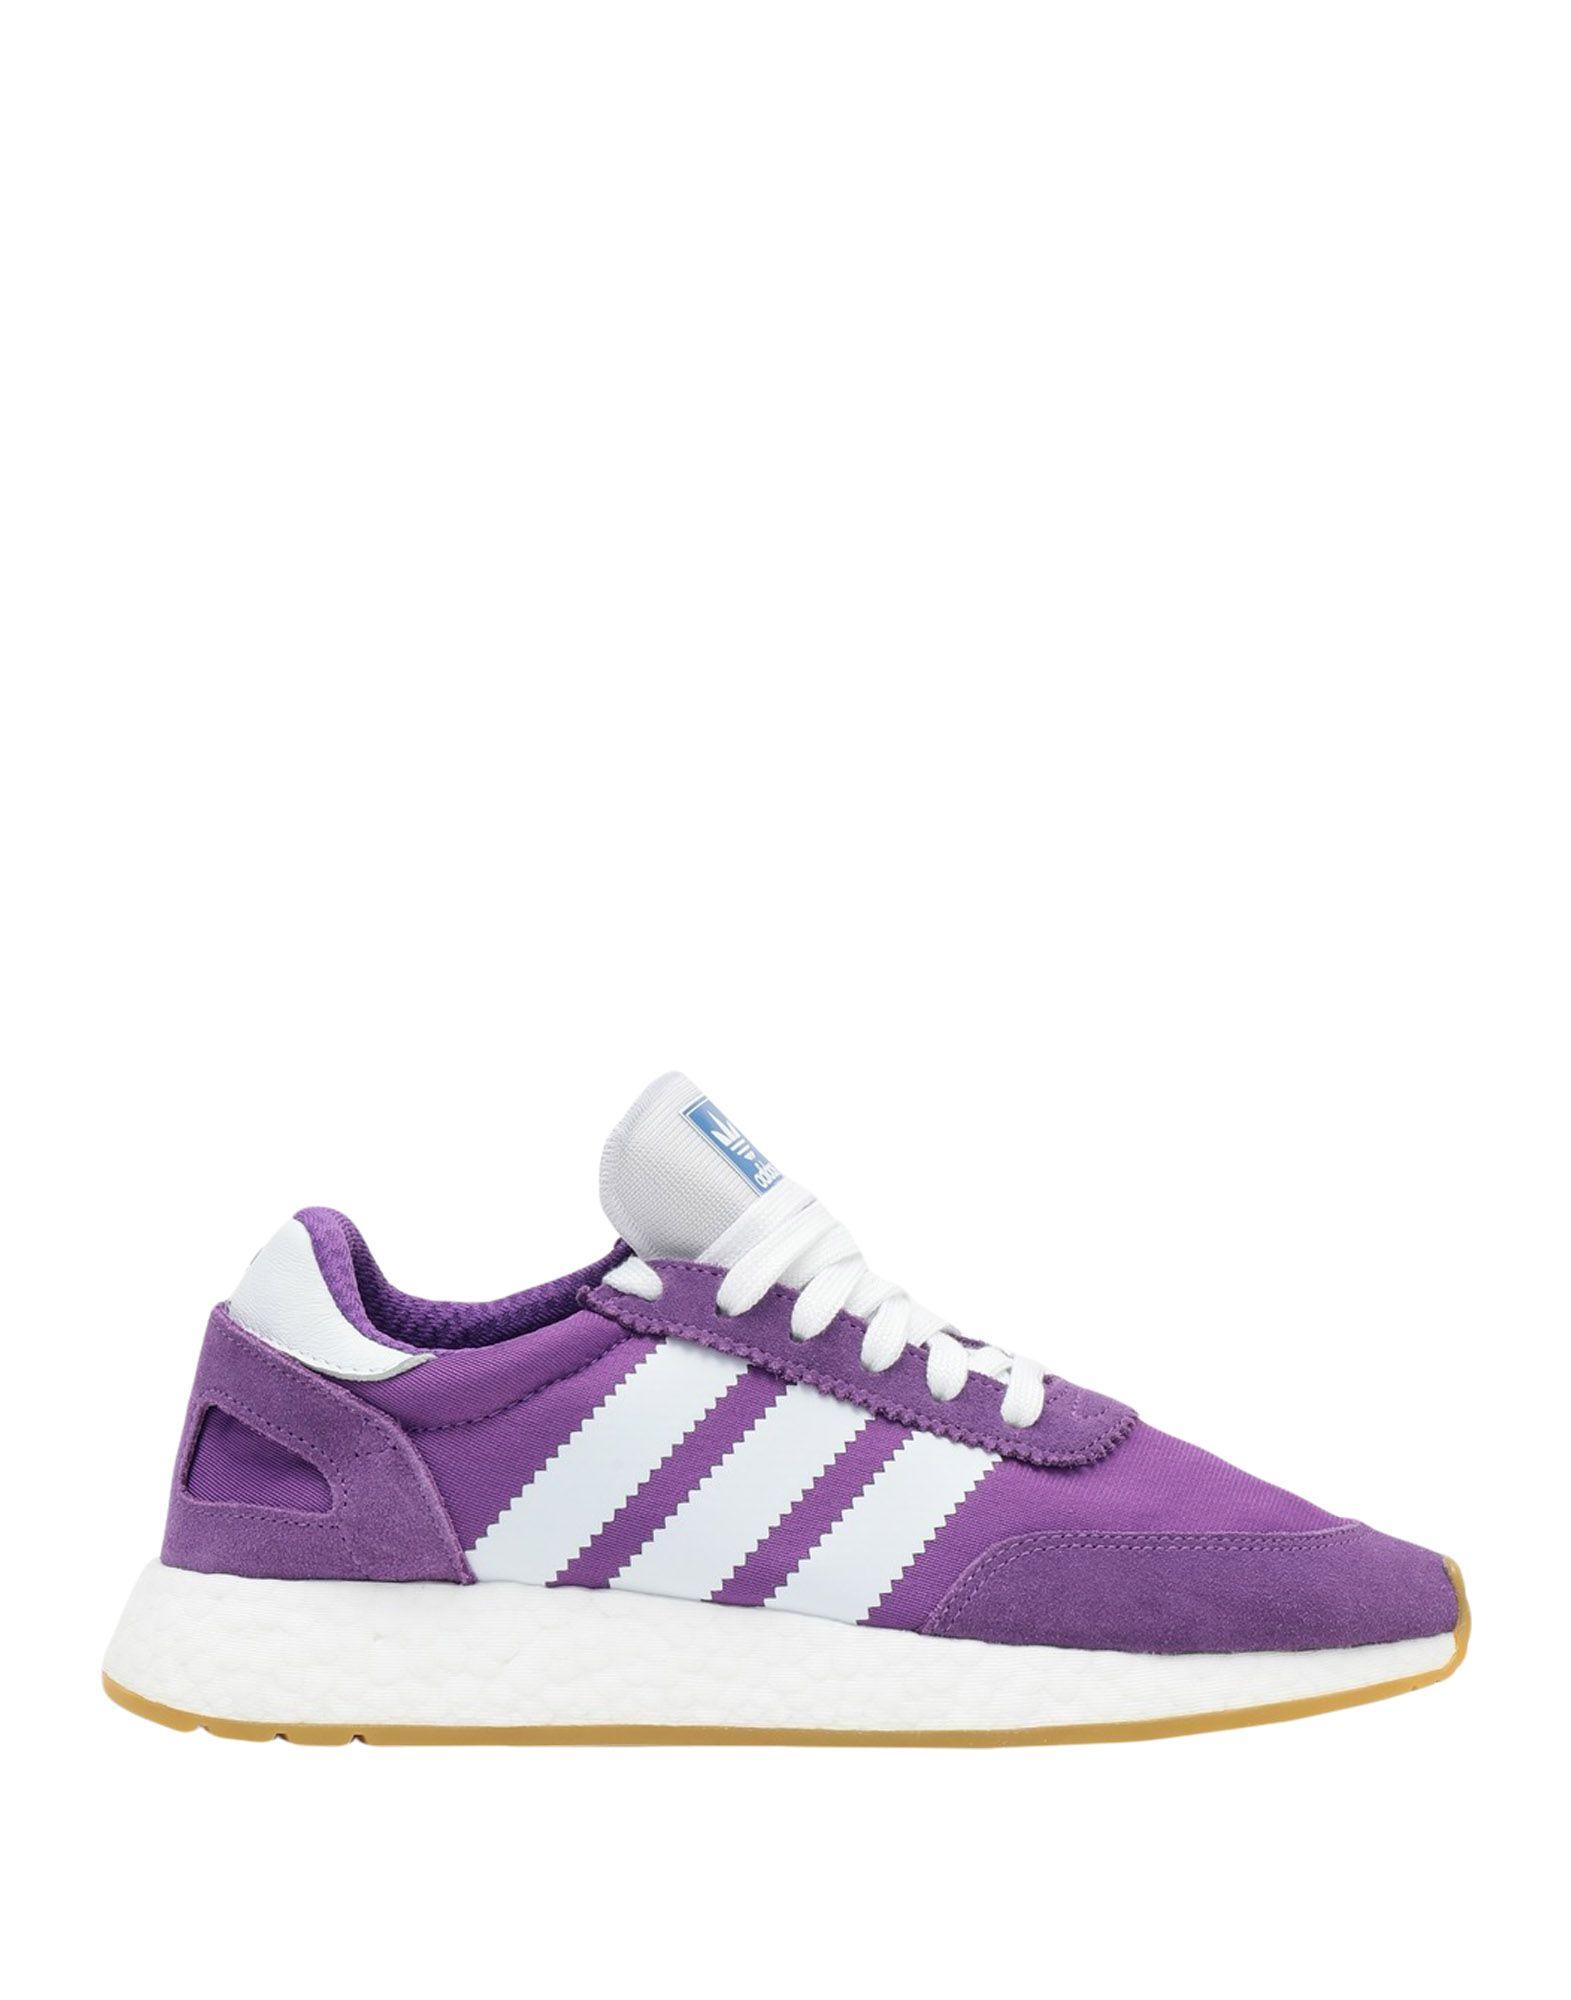 Turnschuhe Adidas Originals I-5923 W - damen - 11644637FX